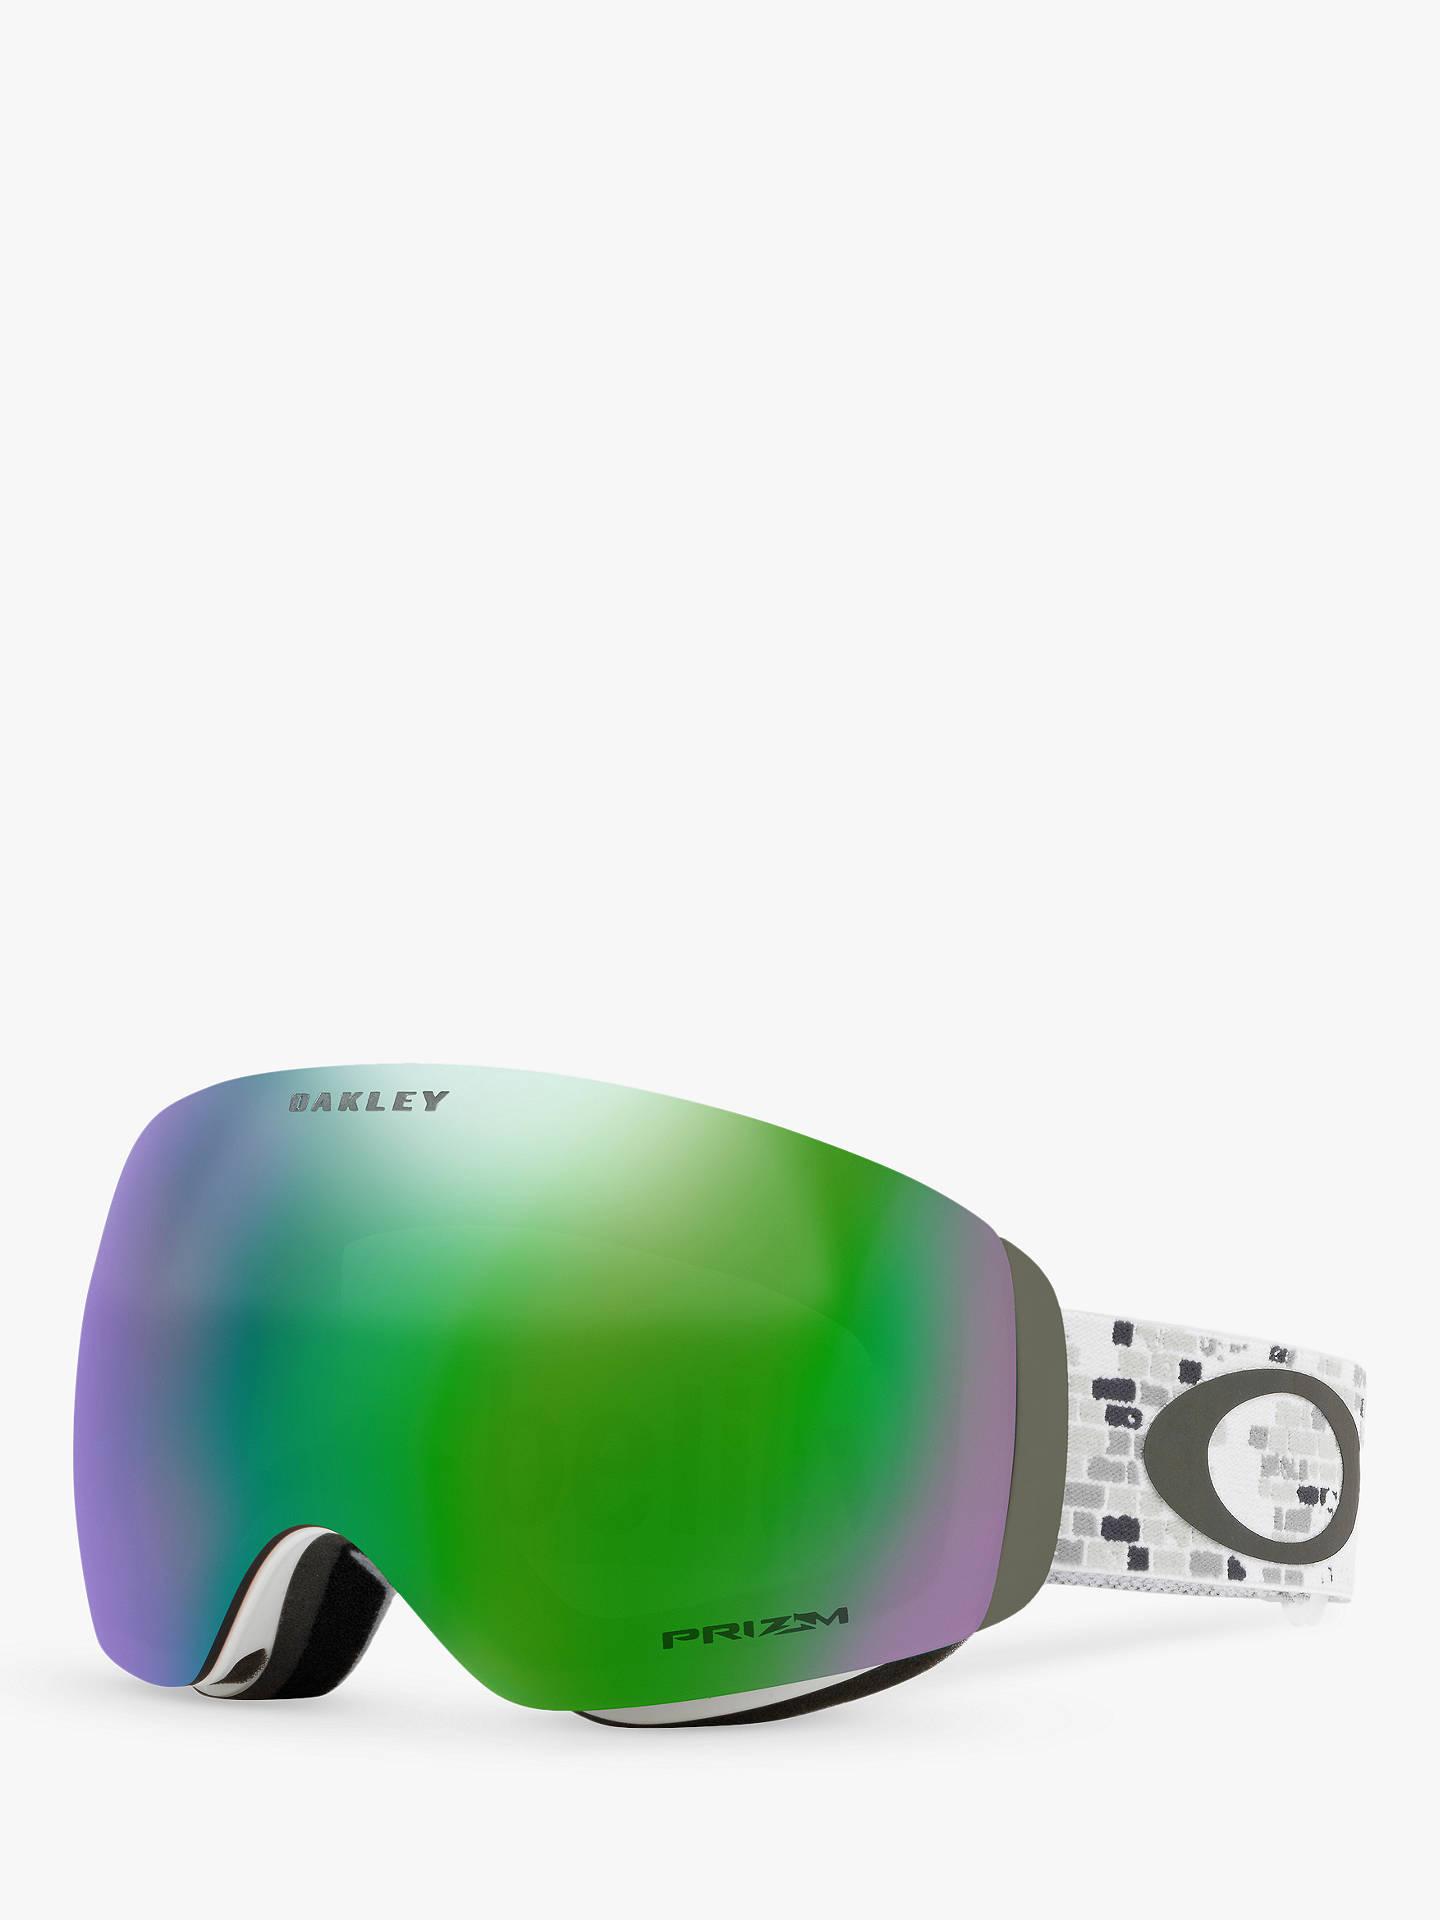 a05d4bda763 Oakley OO7064 Men s Flight Deck XM Lindsey Vonn Prizm Ski Goggles ...